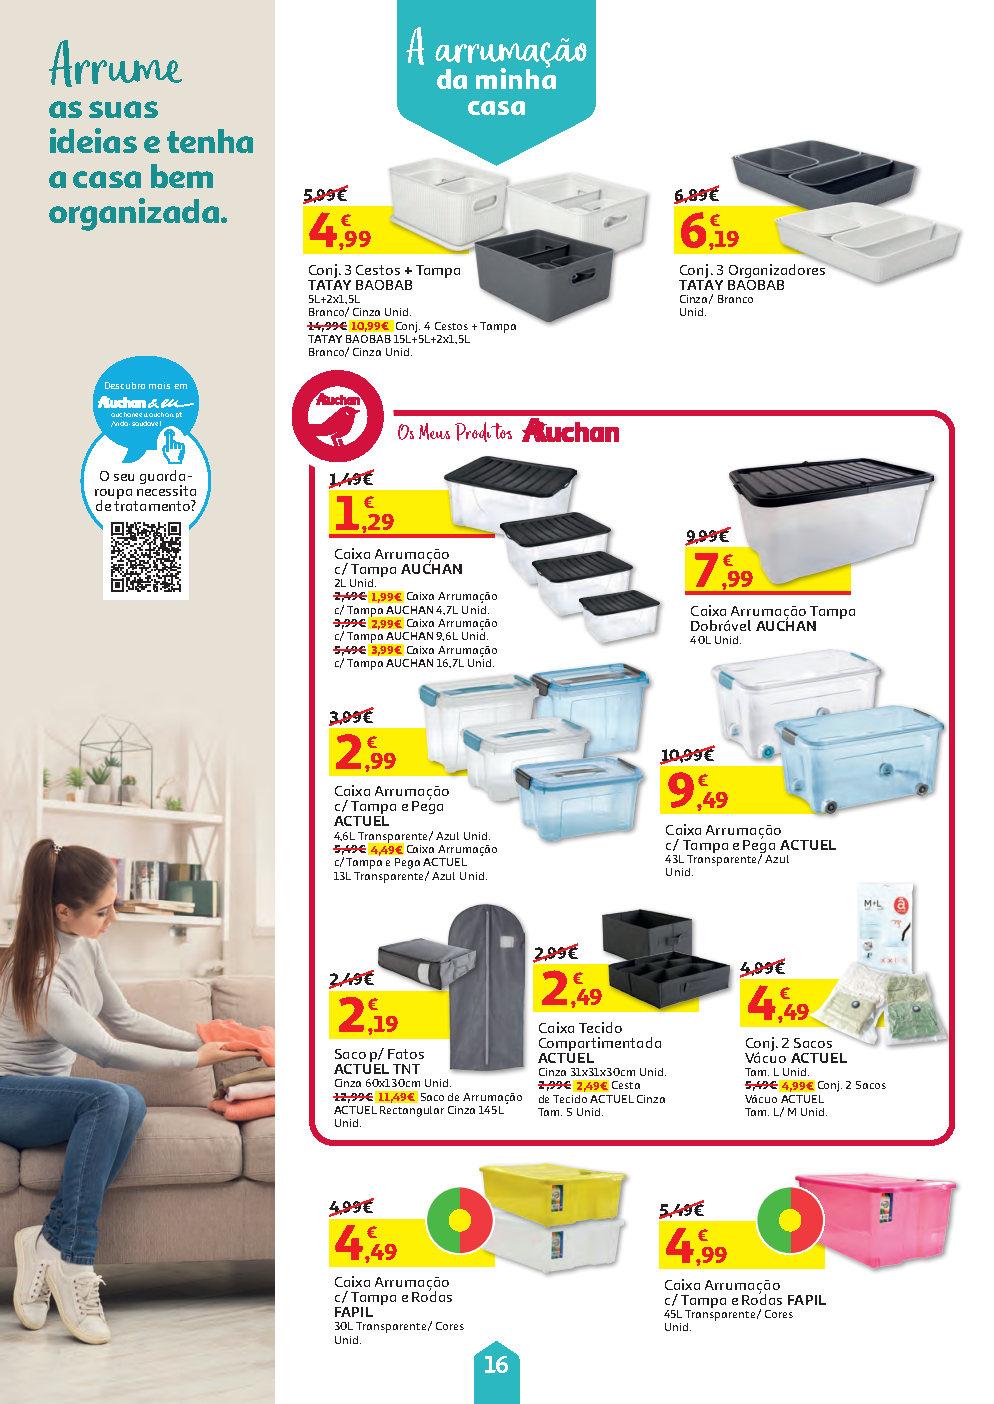 auchan folheto auchan promocoes 5 abril Page1 16